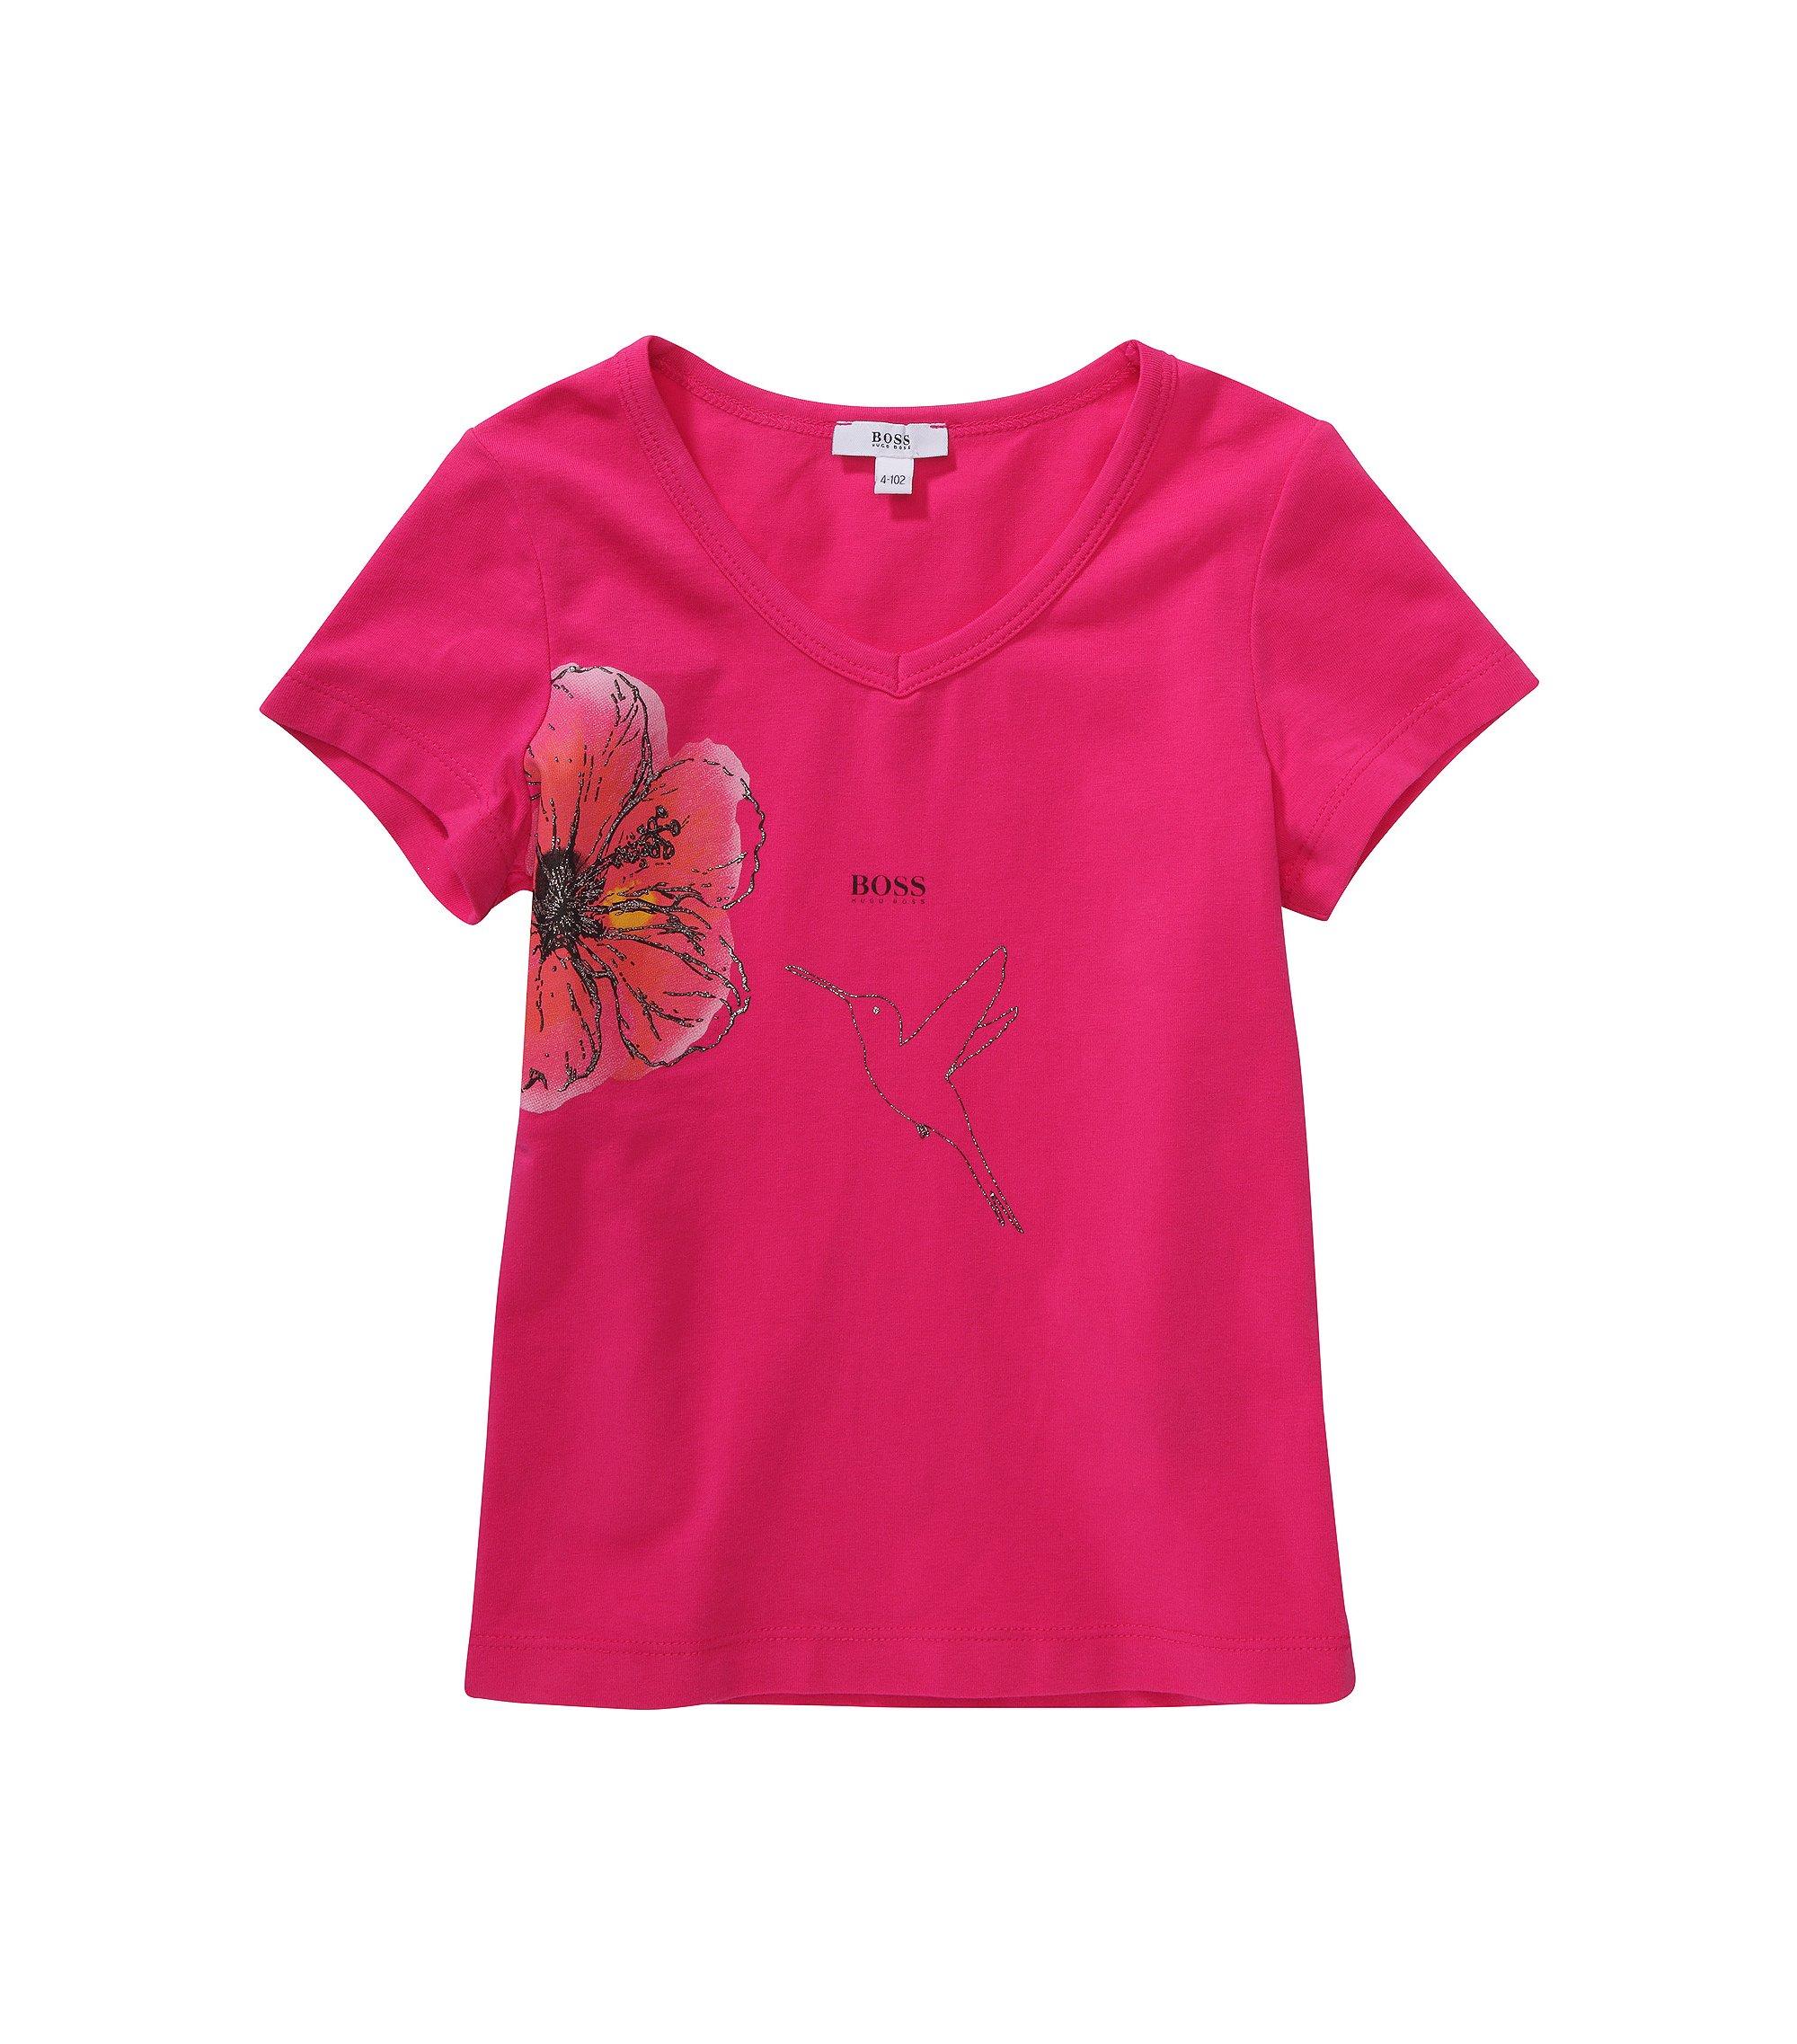 Kids-T-Shirt ´J15292` mit Blumen- und Kolibri-Print, Dunkelrosa